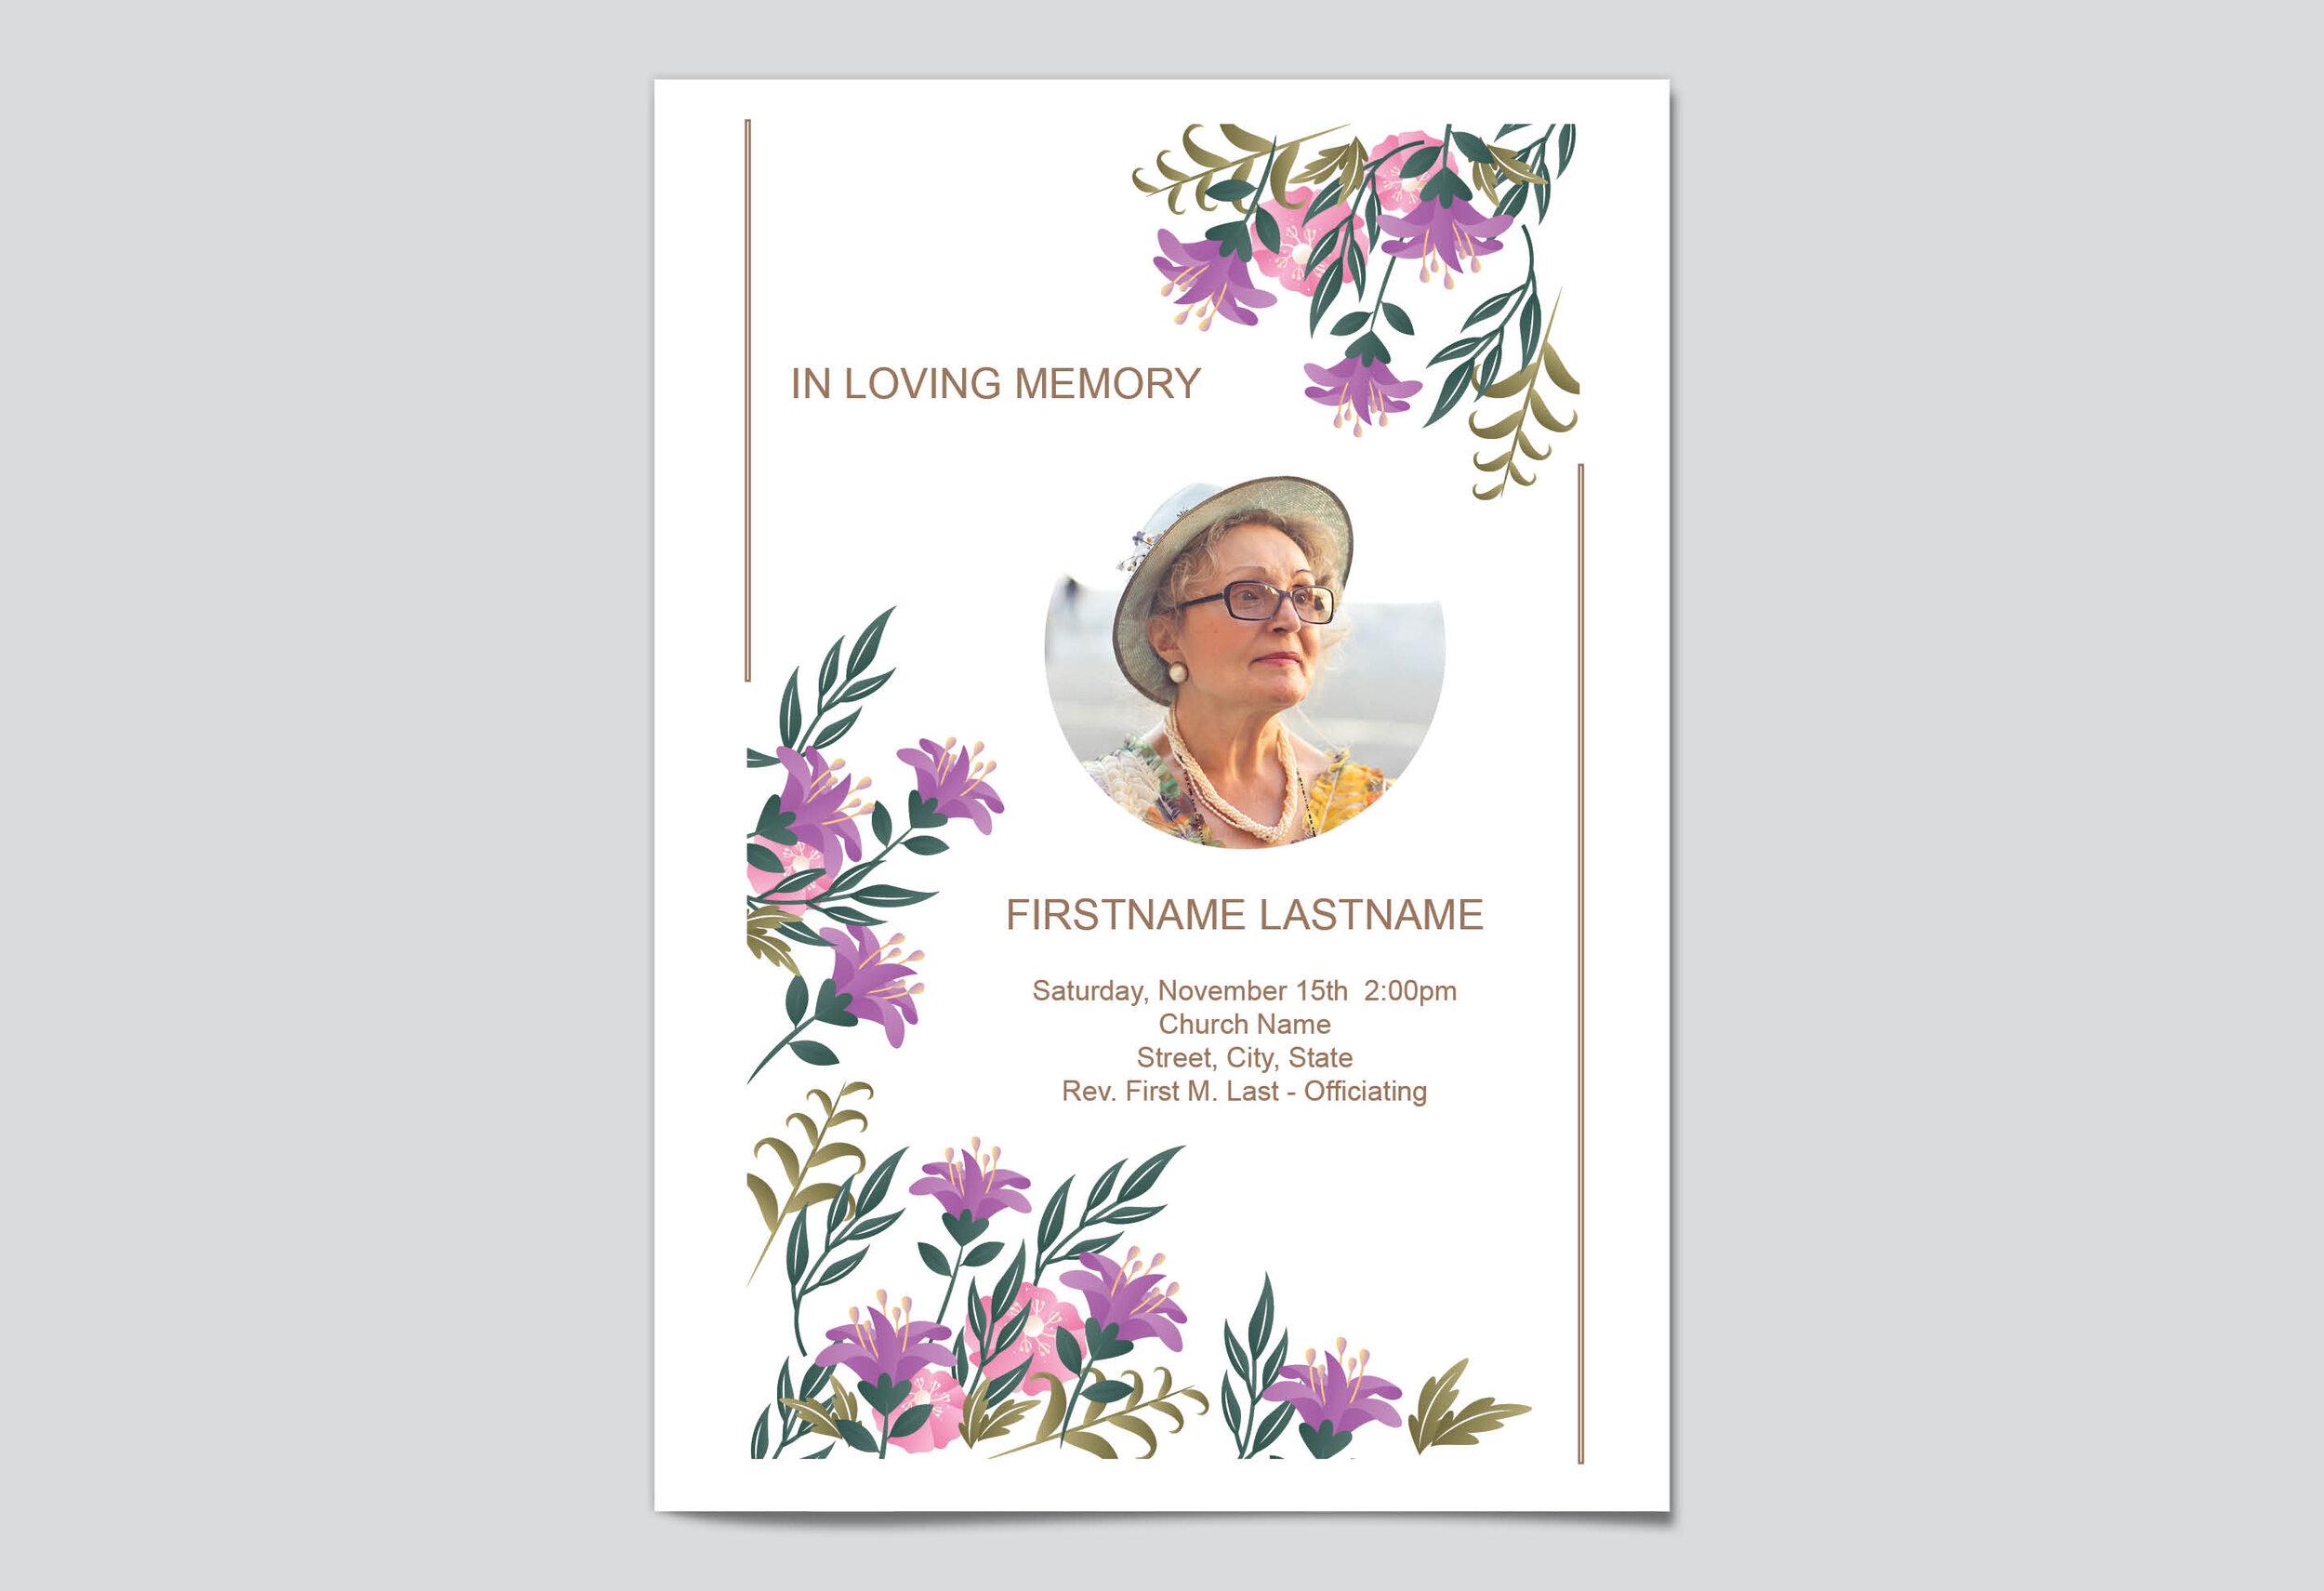 Free Editable Funeral Program Templates  My Wonderful Life Within Church Program Templates Word